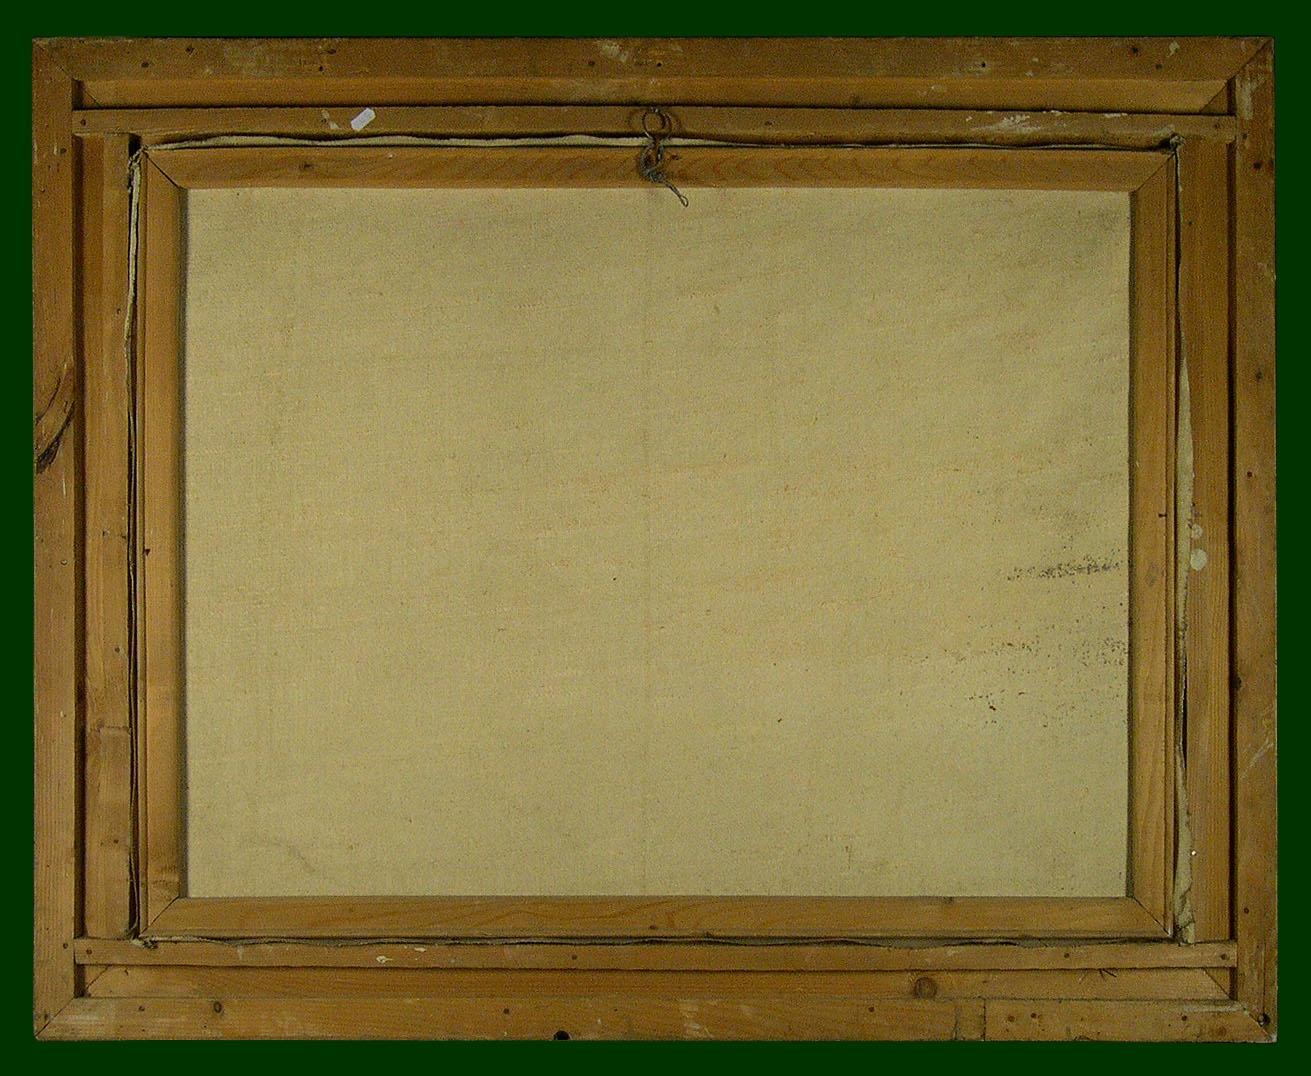 szegedi89-13hat.JPG (1311×1076)